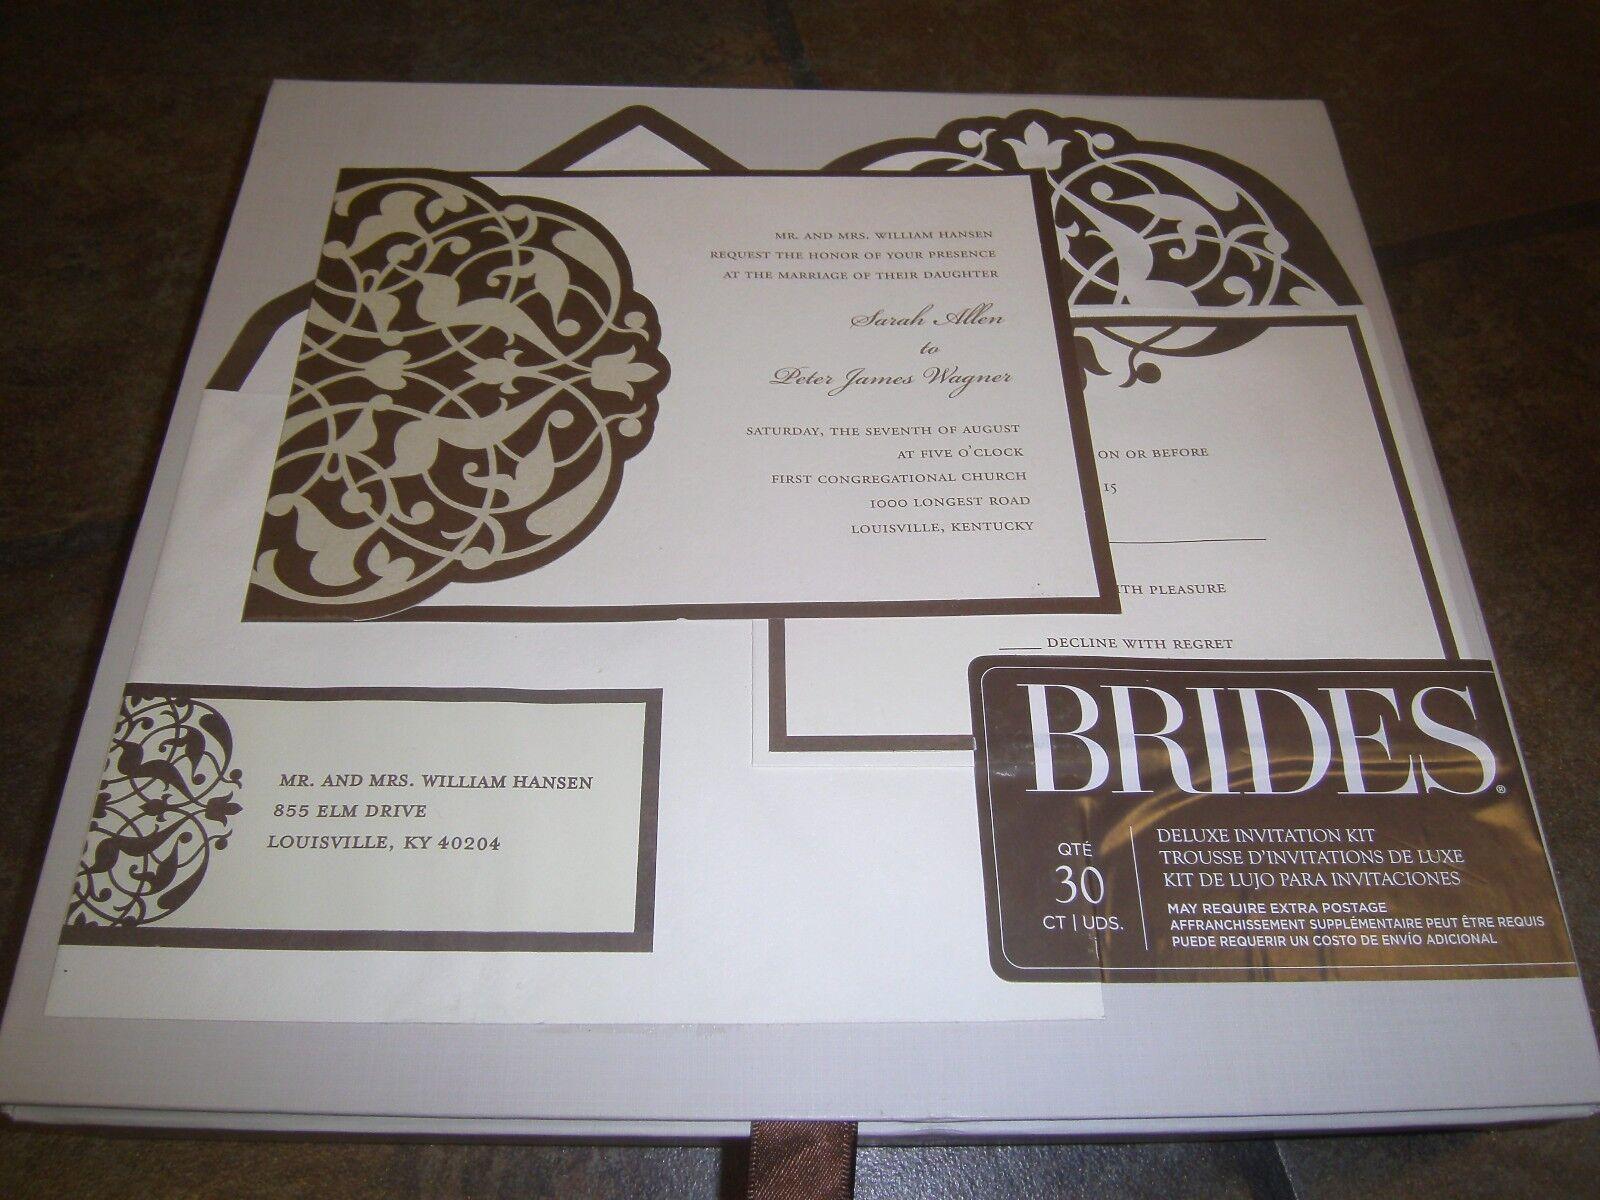 Gartner Studios DIY Brides Deluxe Wedding Invitation Kit 30 Ct Brown ...